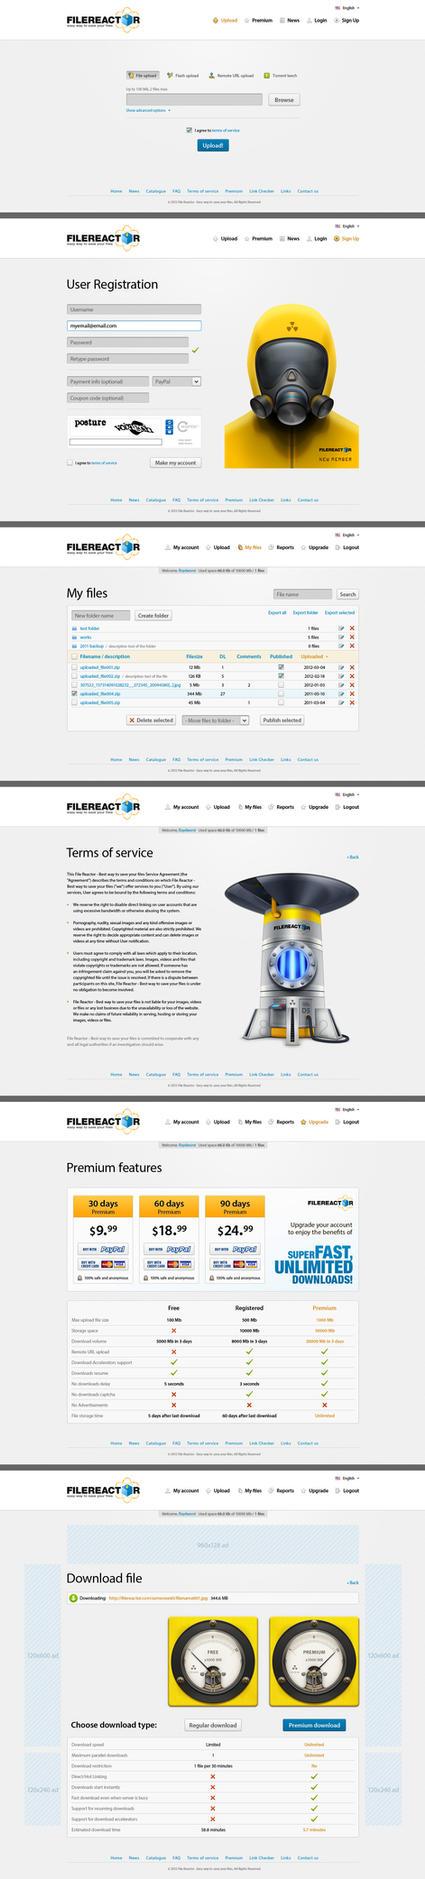 File Reactor website by floydworx